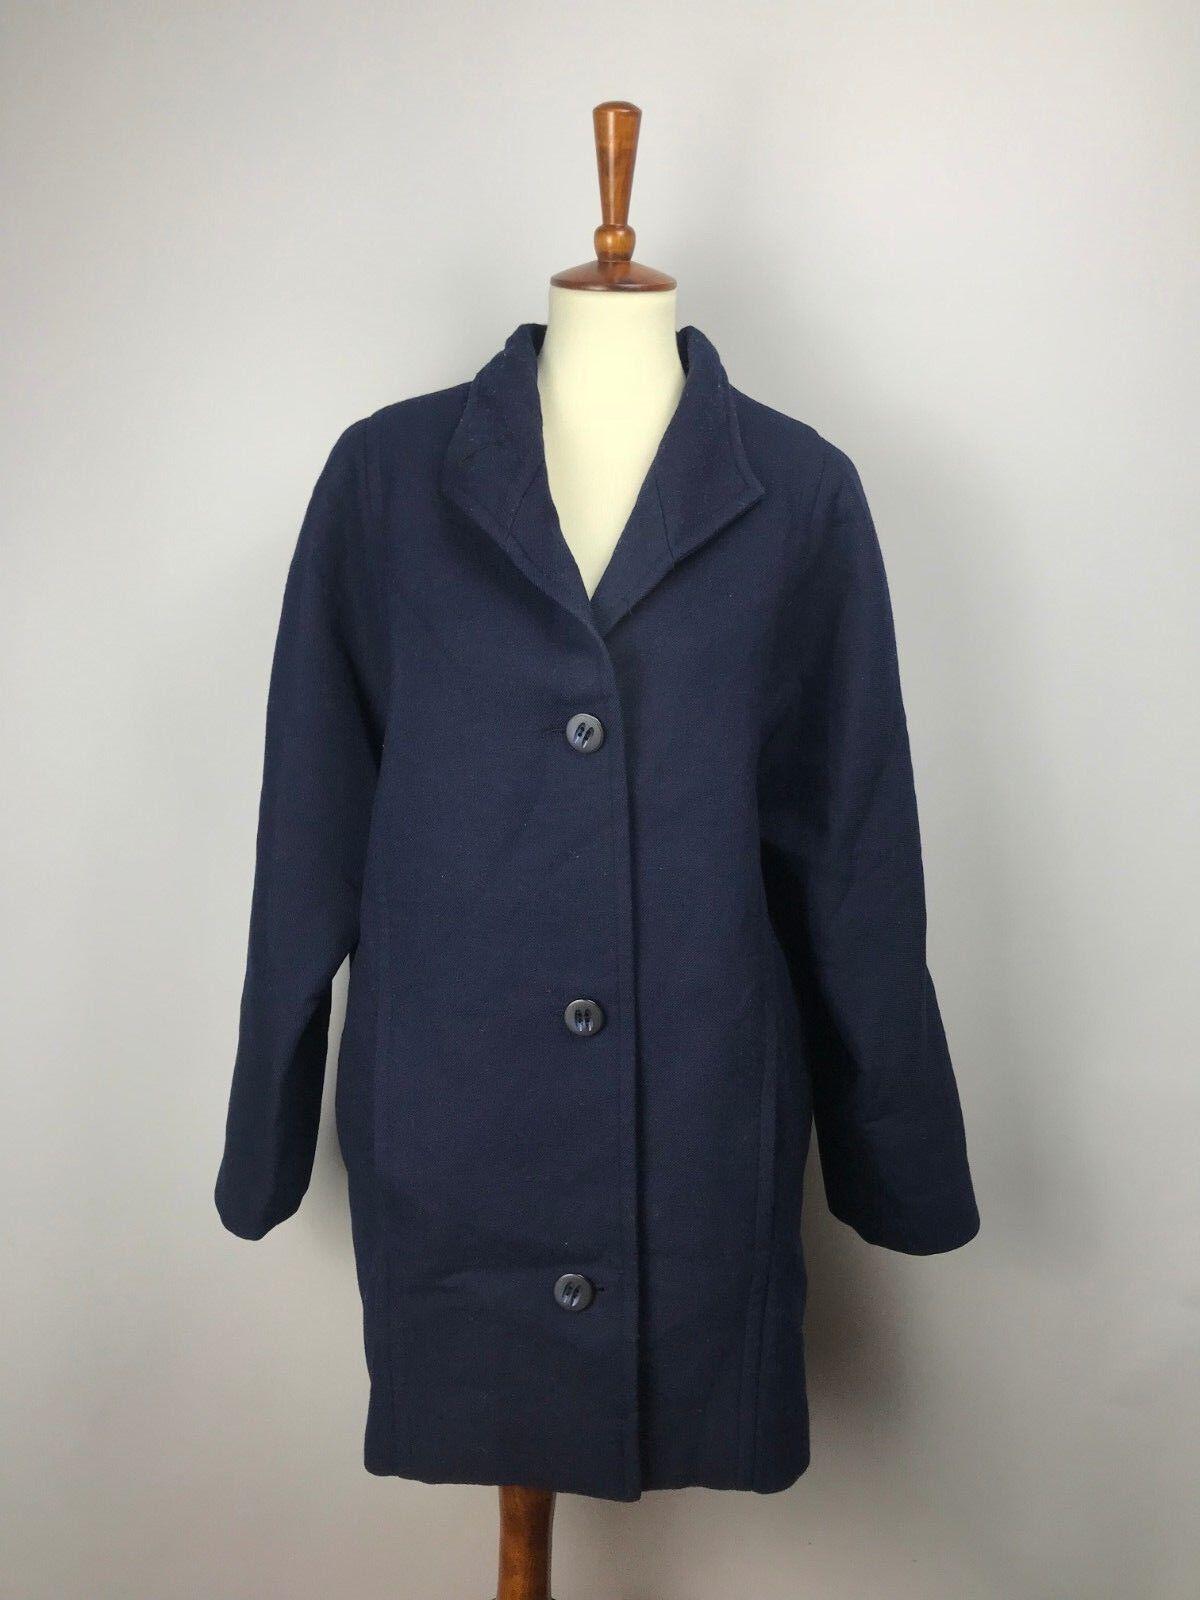 Nina Ricci Boutique Paris Wool bluee Coat 40 12 L Large France Luxury Rare